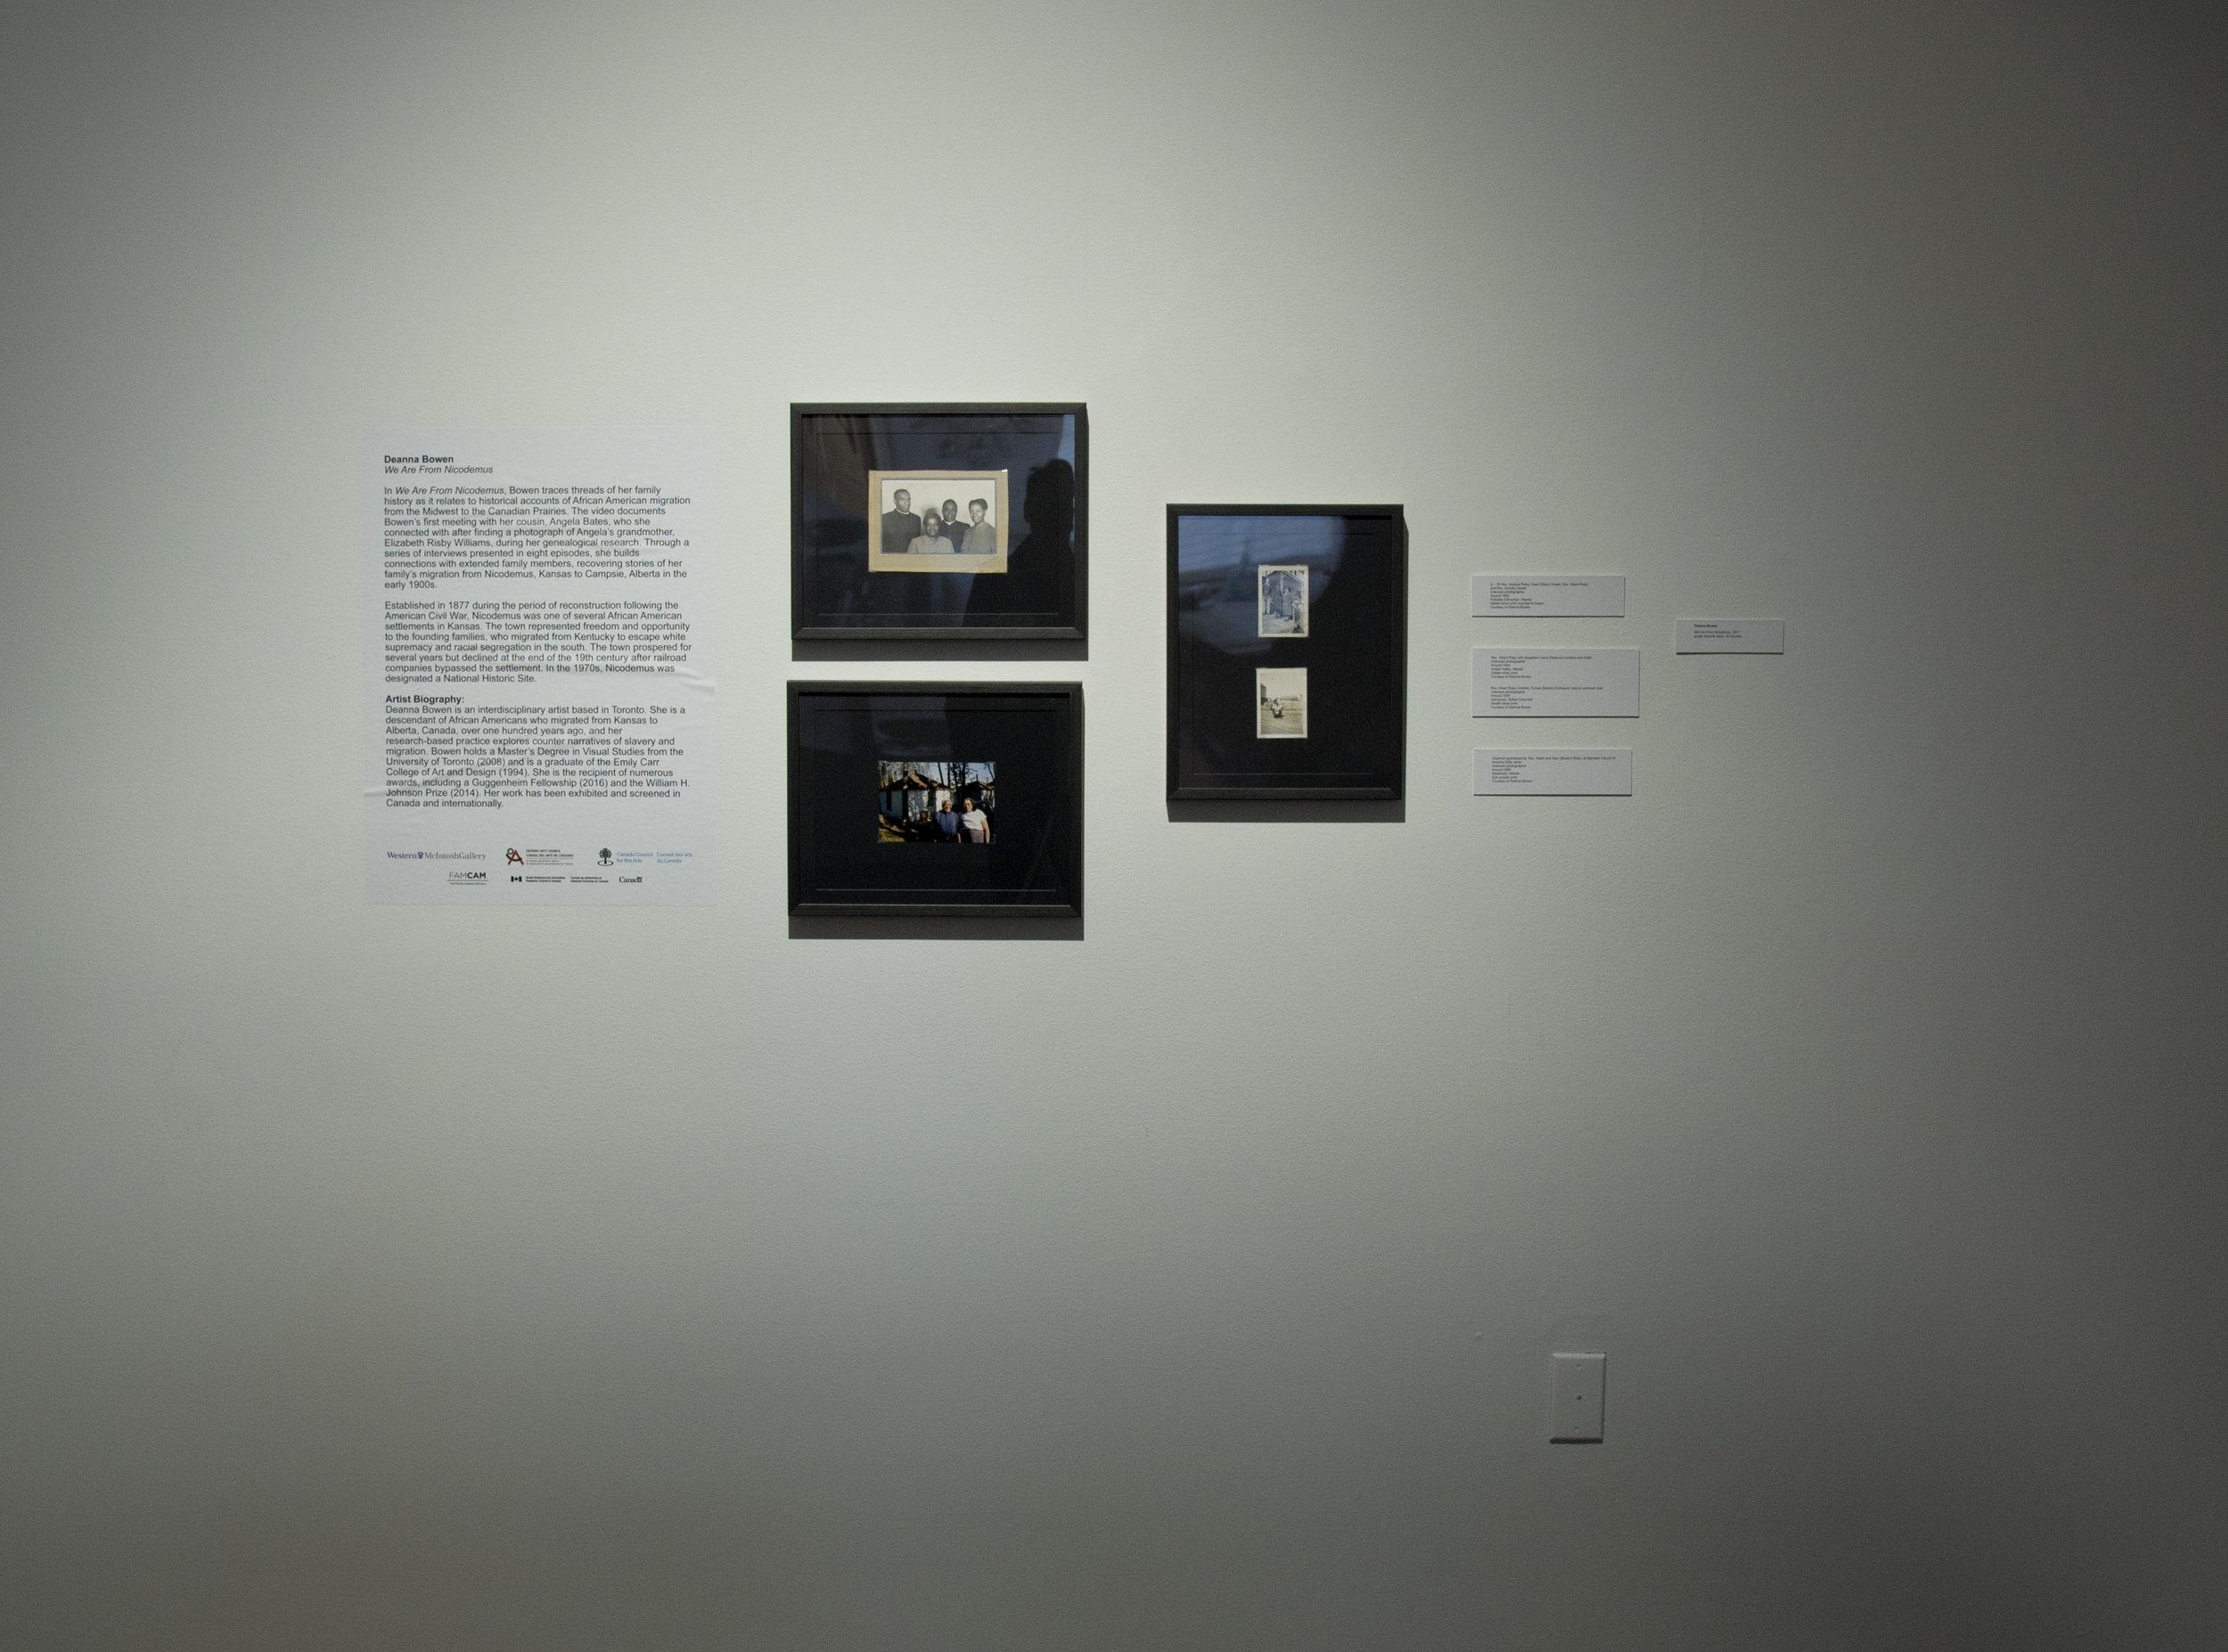 Deanna Bowen,  We Are From Nicodemus  (2017) ,  Installation View (Mcintosh Gallery, UWO, 2019)